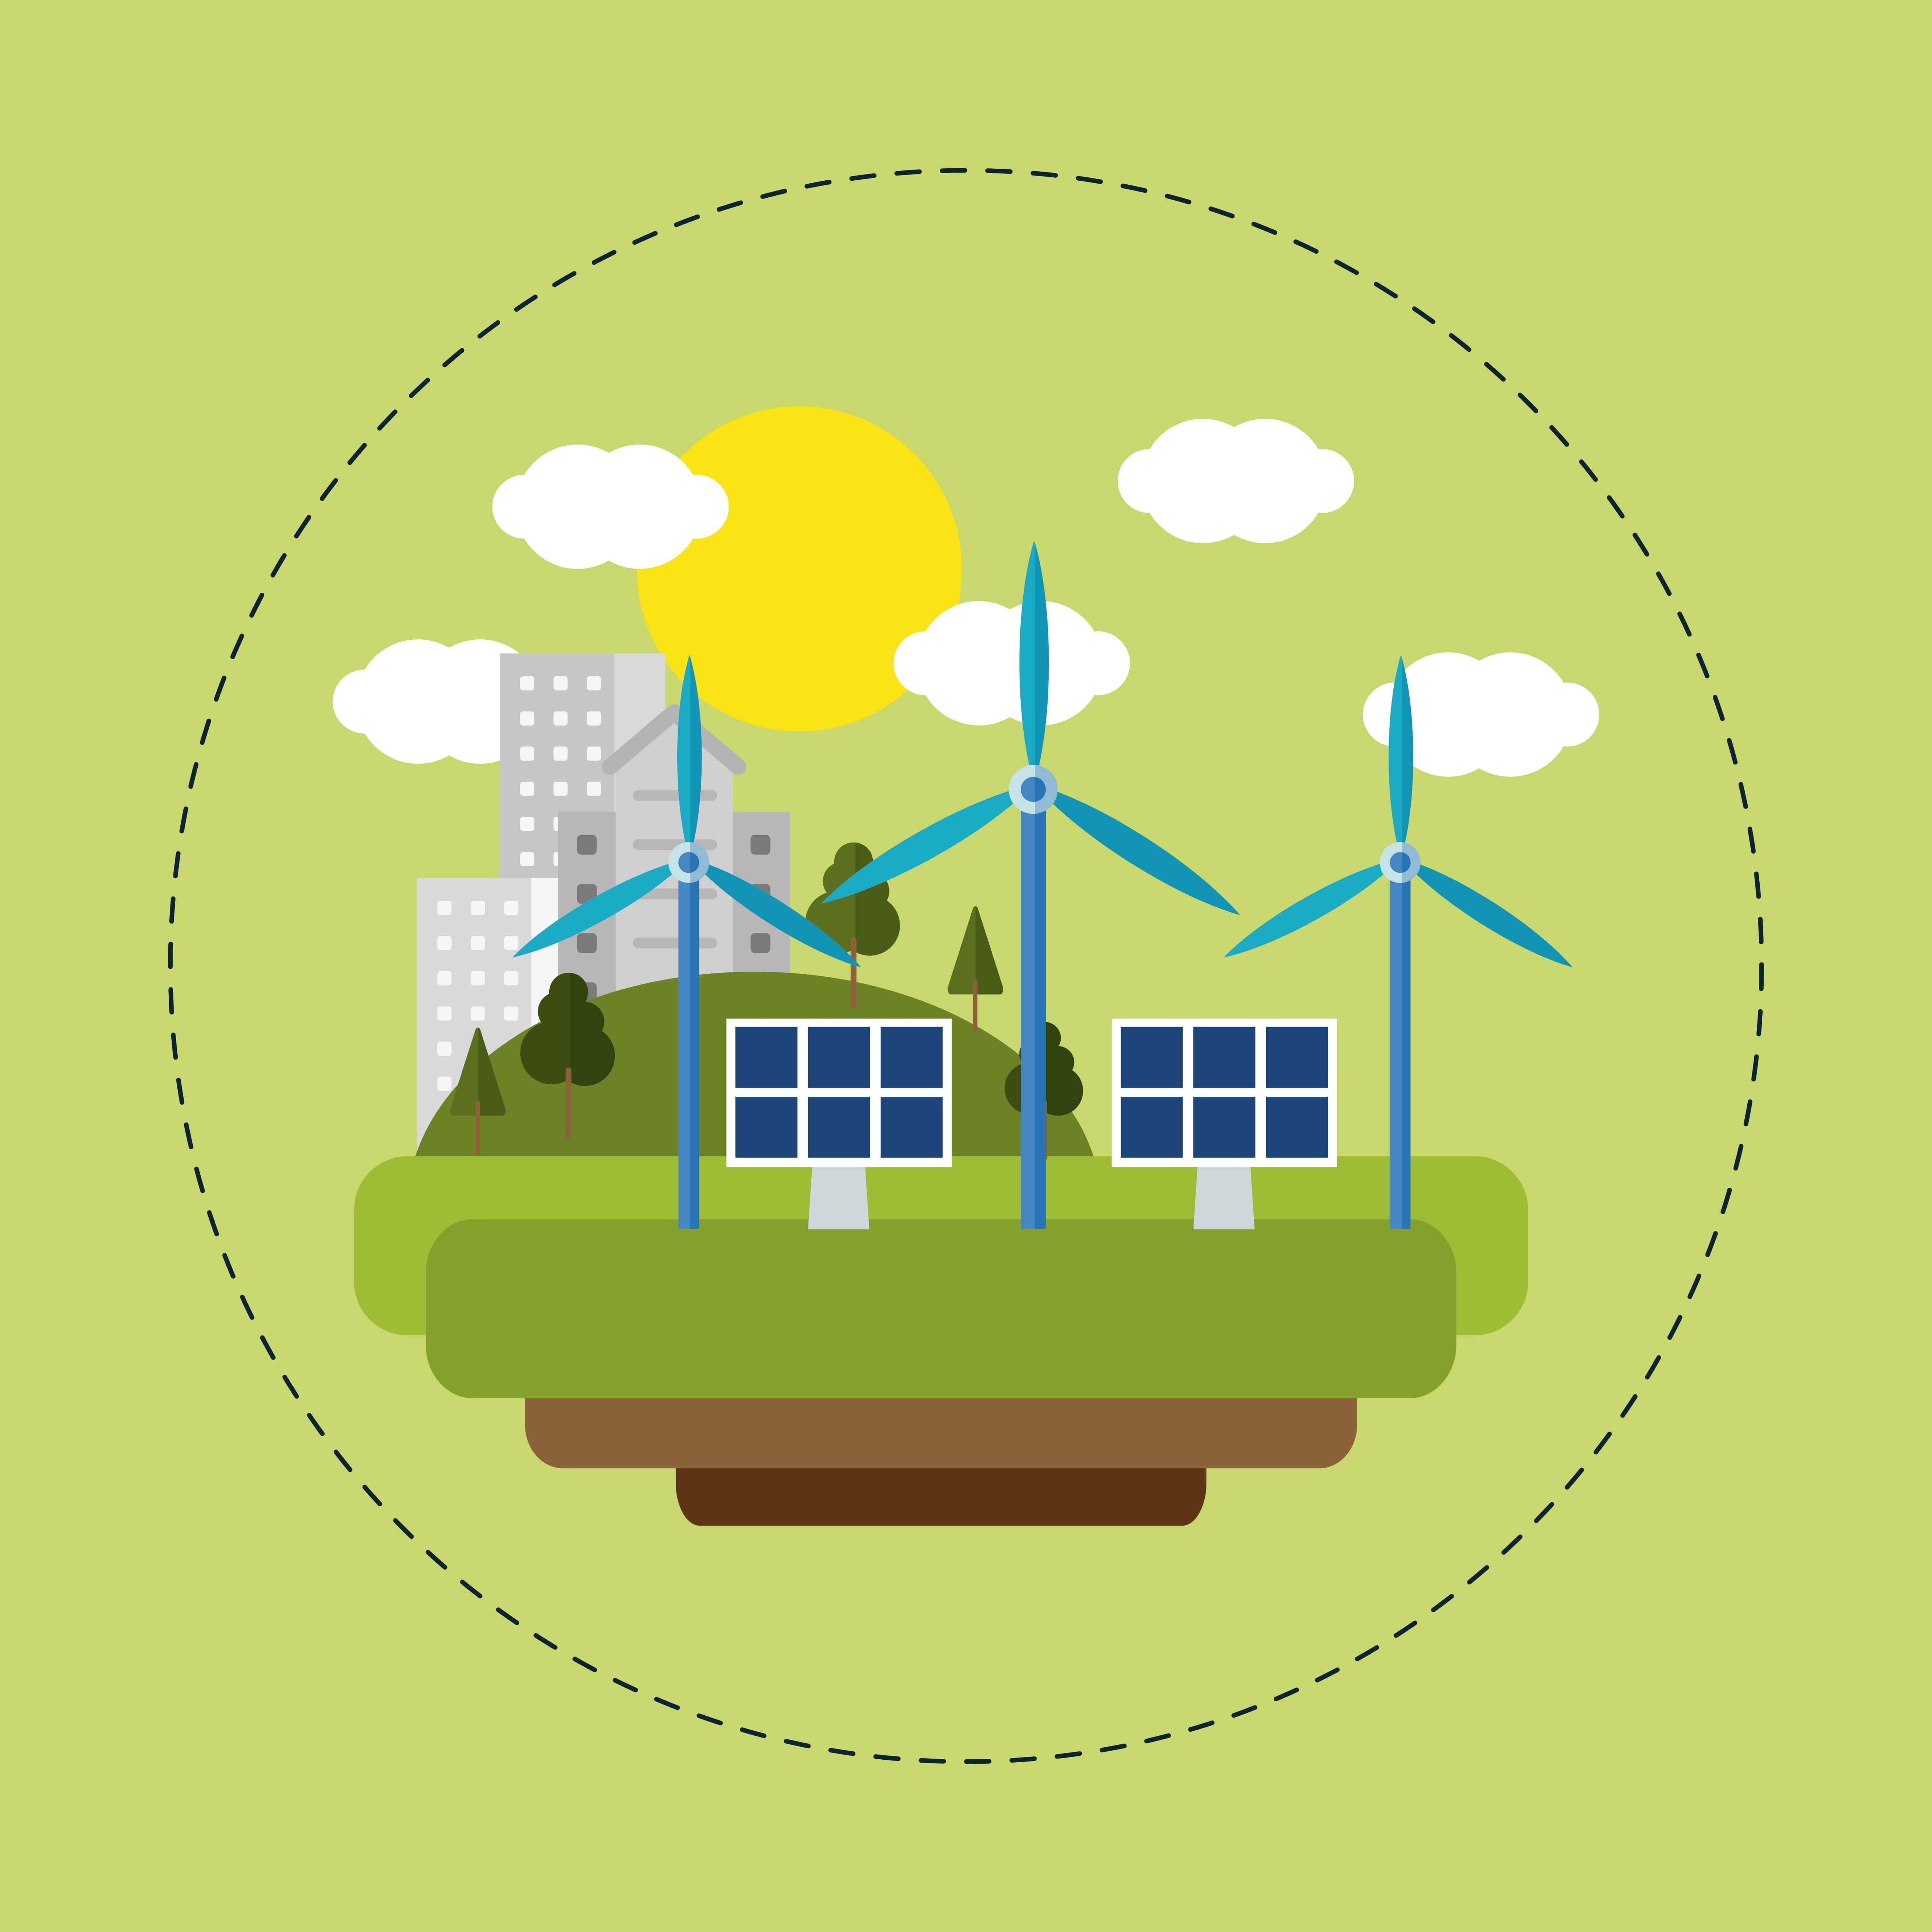 Fuel Alternatives for renewable energy